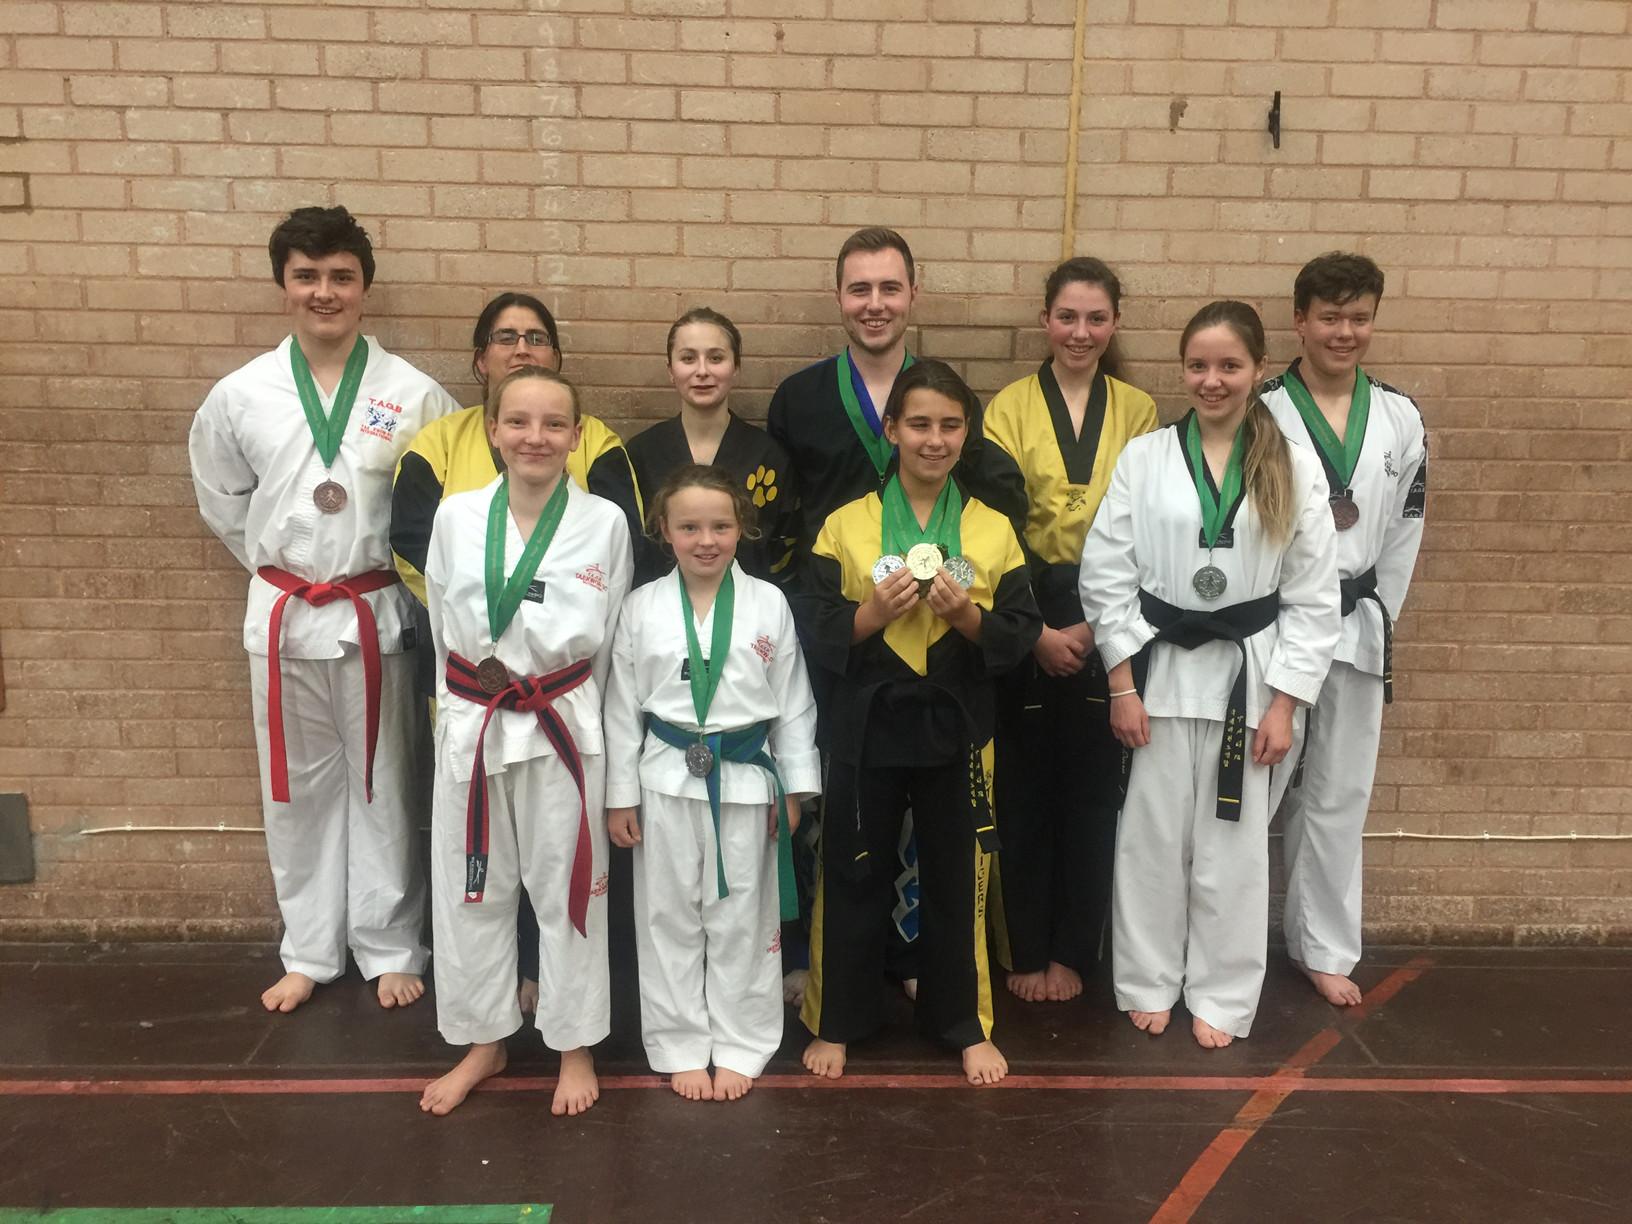 martialarts4fun sport south devon taekwondo southern championships TAGB